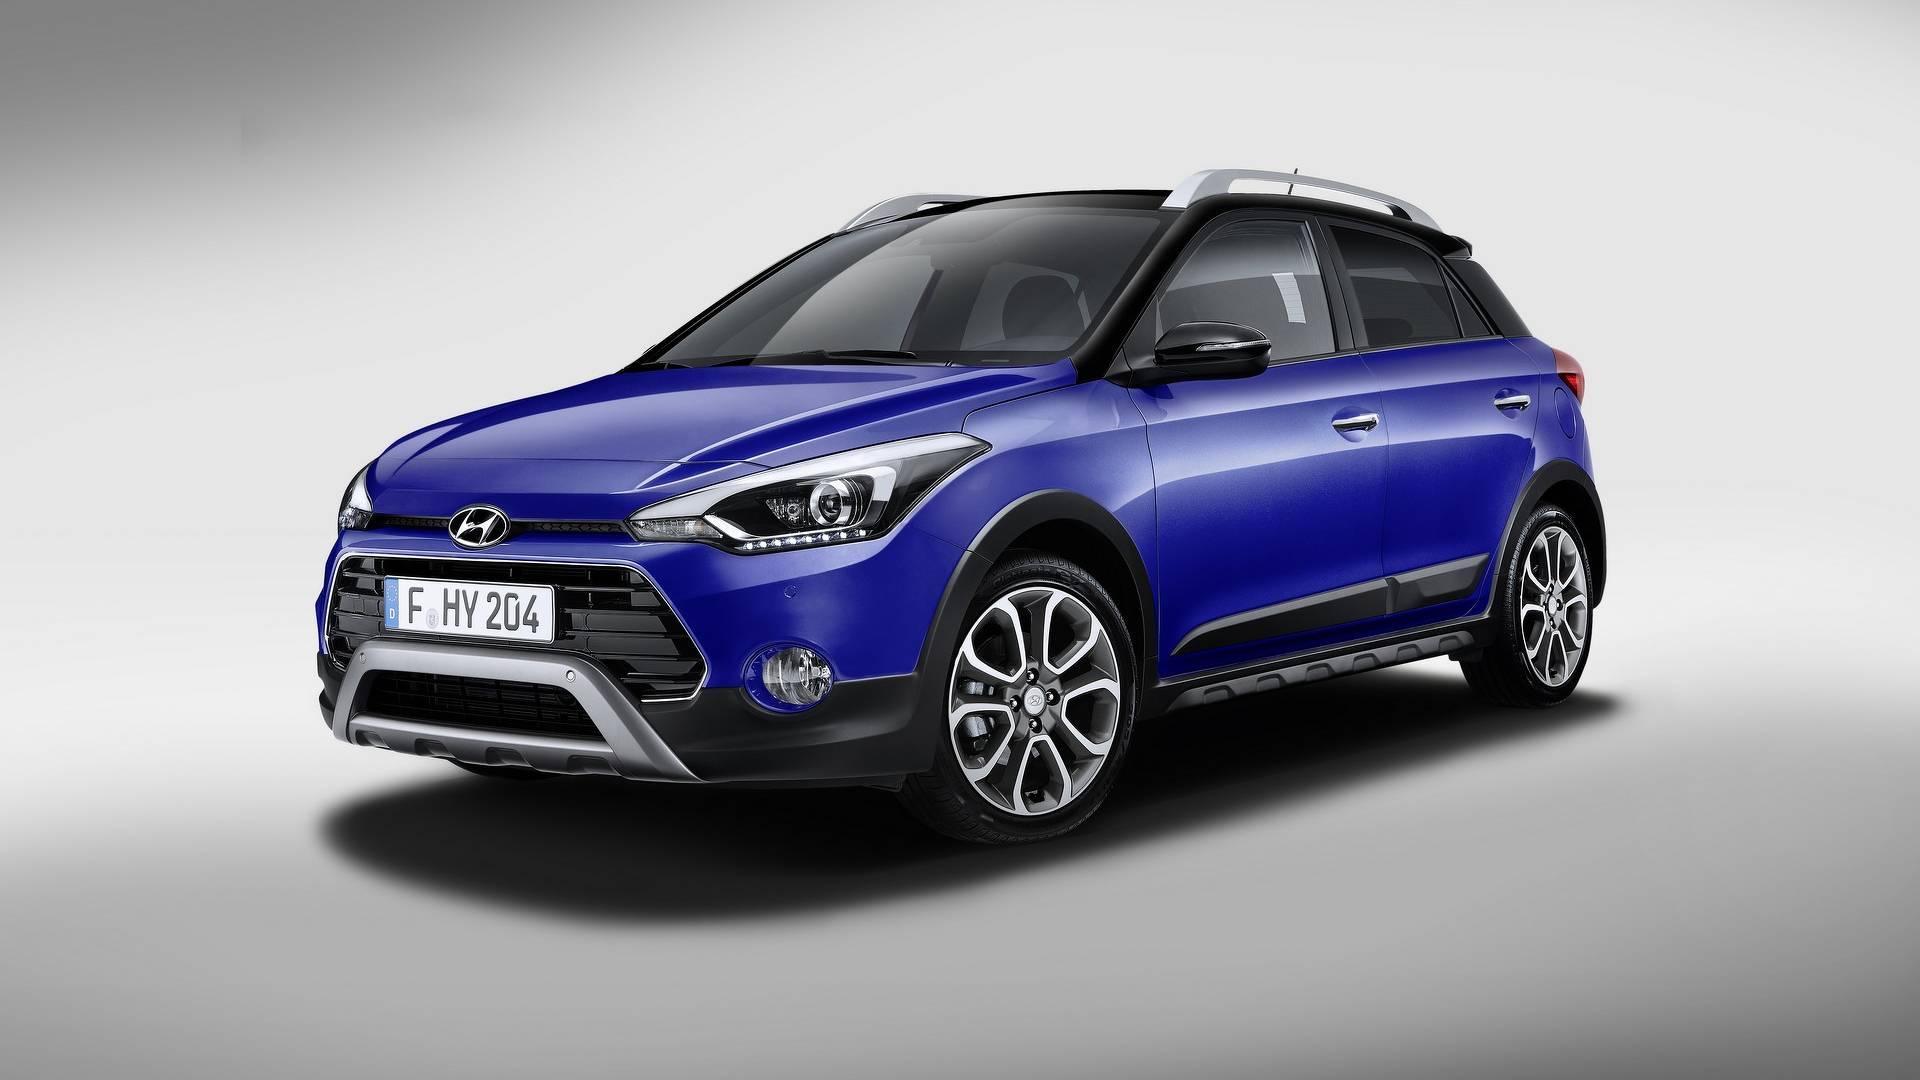 2019_Hyundai_i20_Active_0003